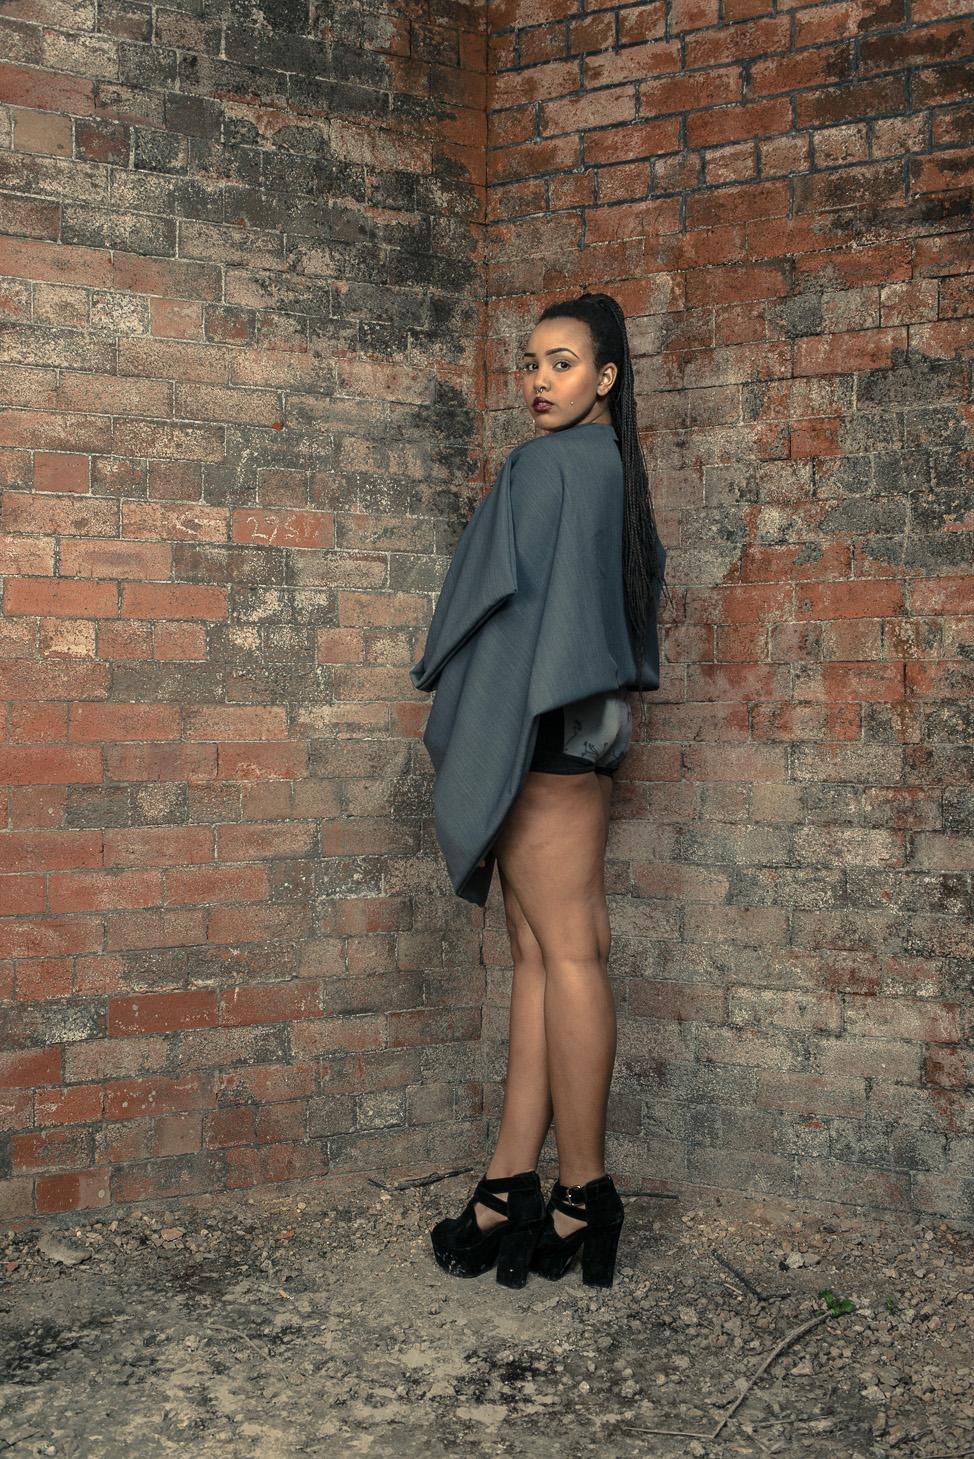 zaramia-ava-zaramiaava-leeds-fashion-designer-ethical-sustainable-tailored-minimalist-cape-versatile-drape-grey-bodysuit-black-belt-wrap-cowl-styling-womenswear-models-photoshoot-location-21